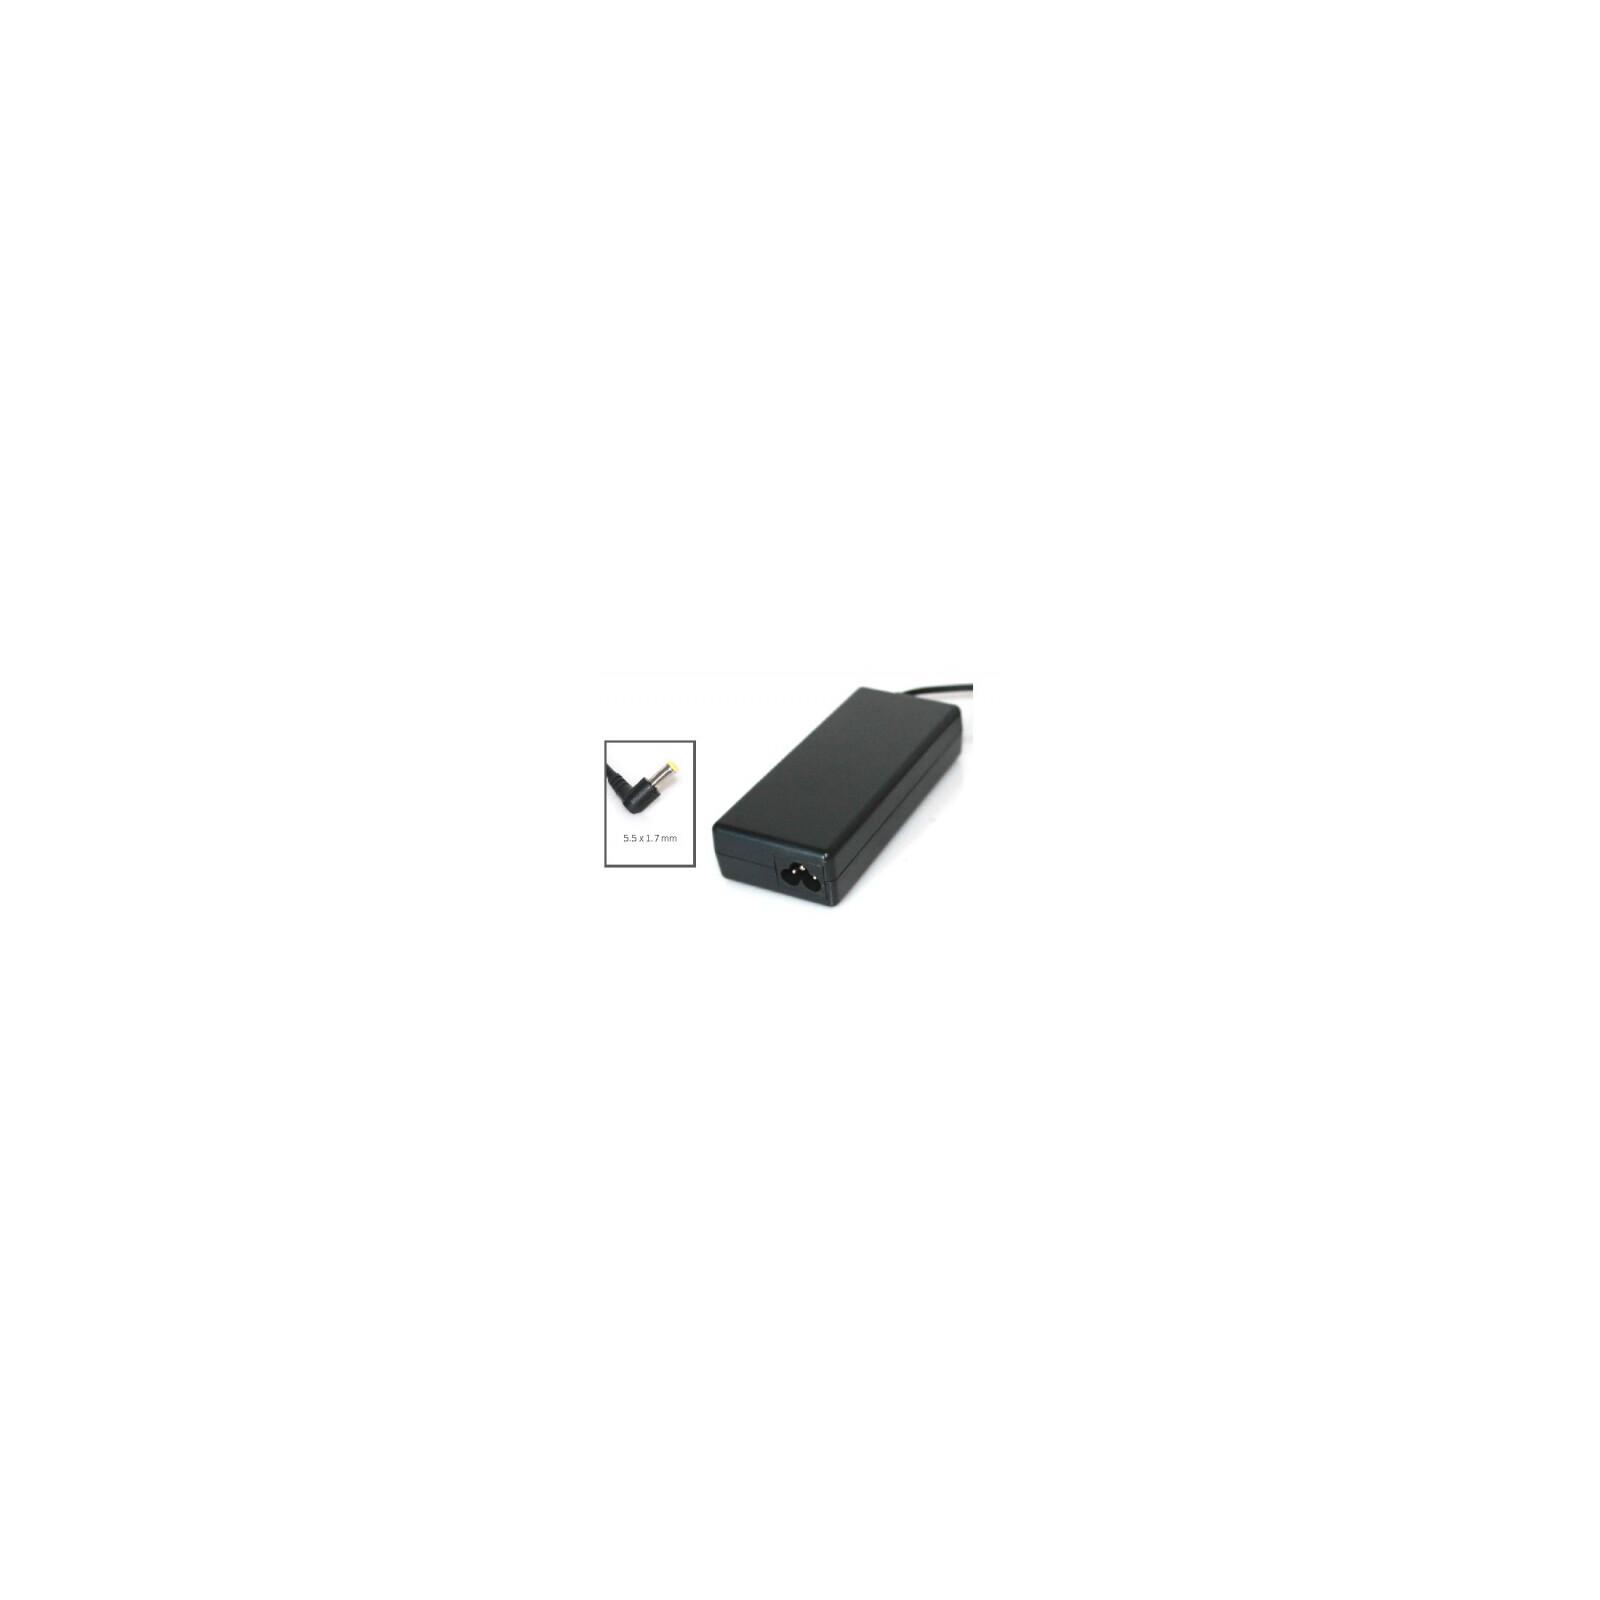 AGI Netzteil Acer Aspire 3640 90W